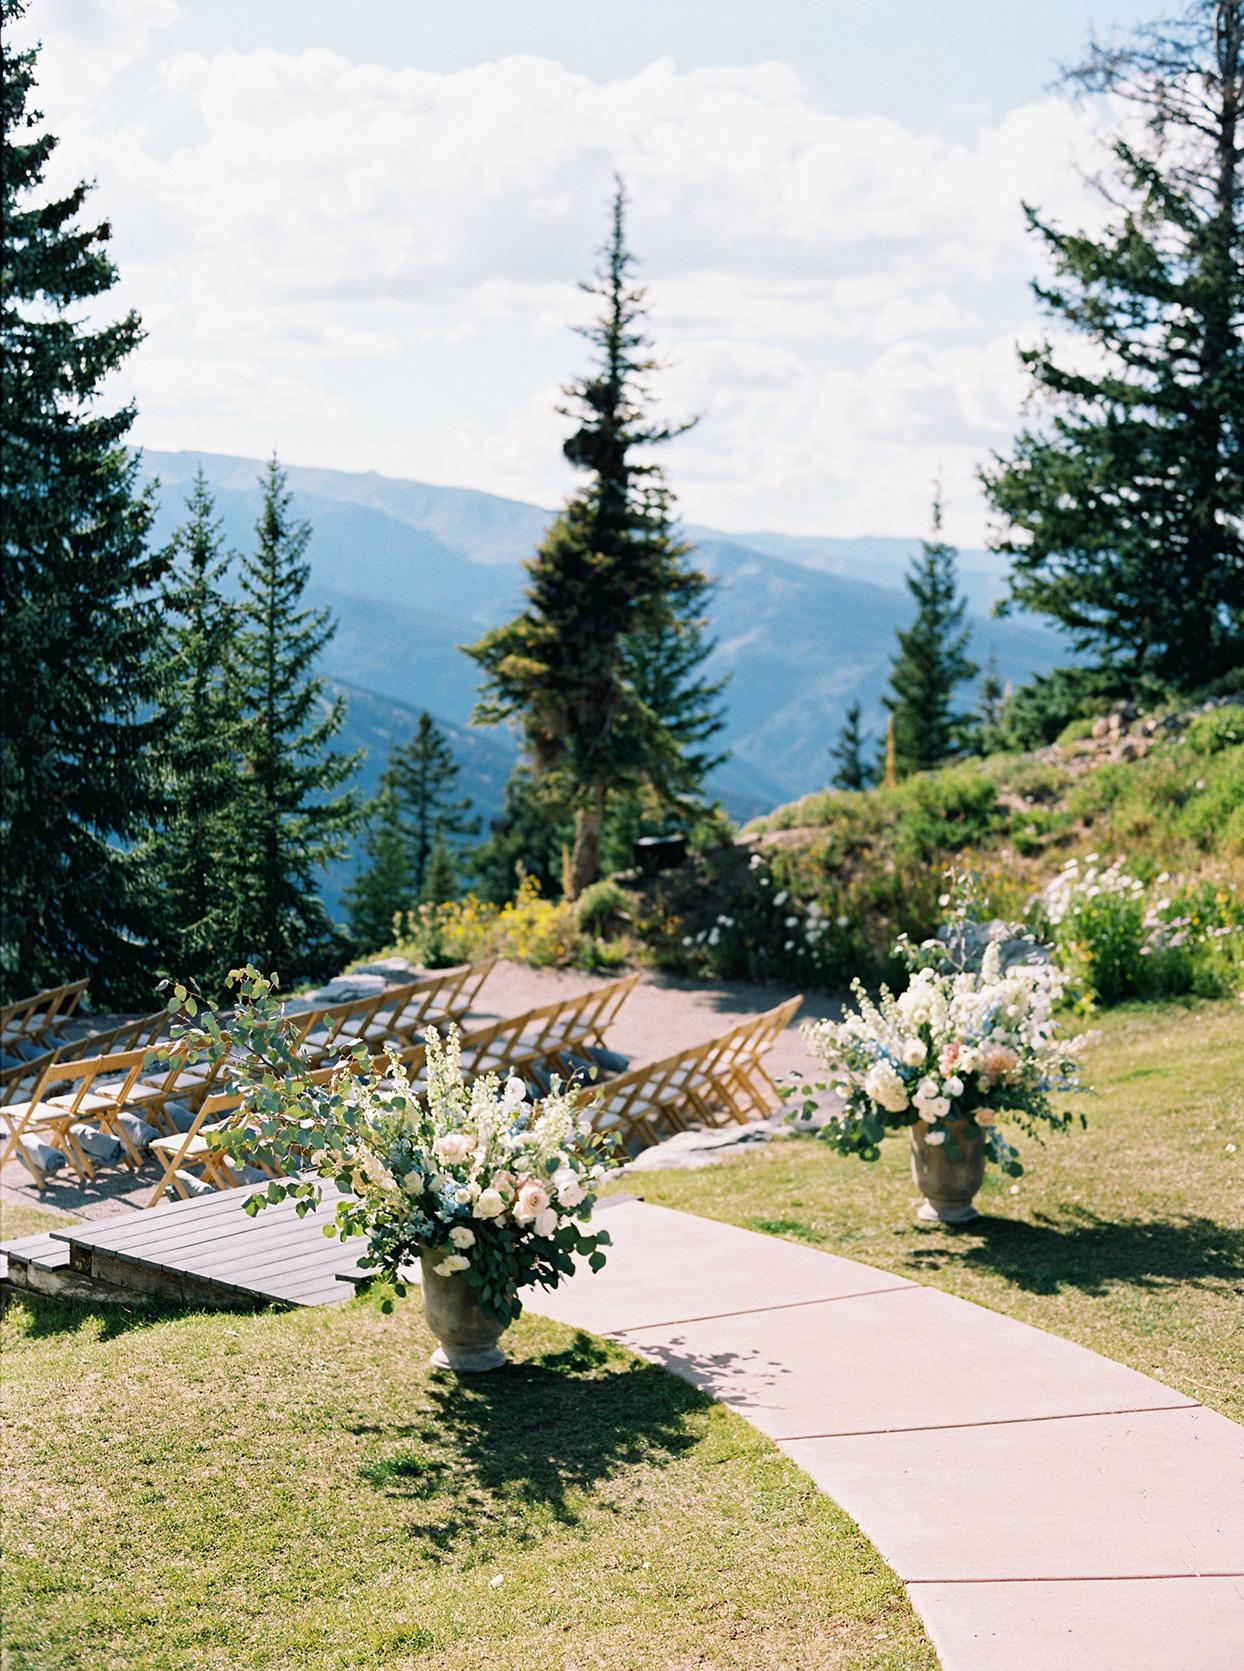 kimmie mike wedding ceremony walkway with flowers